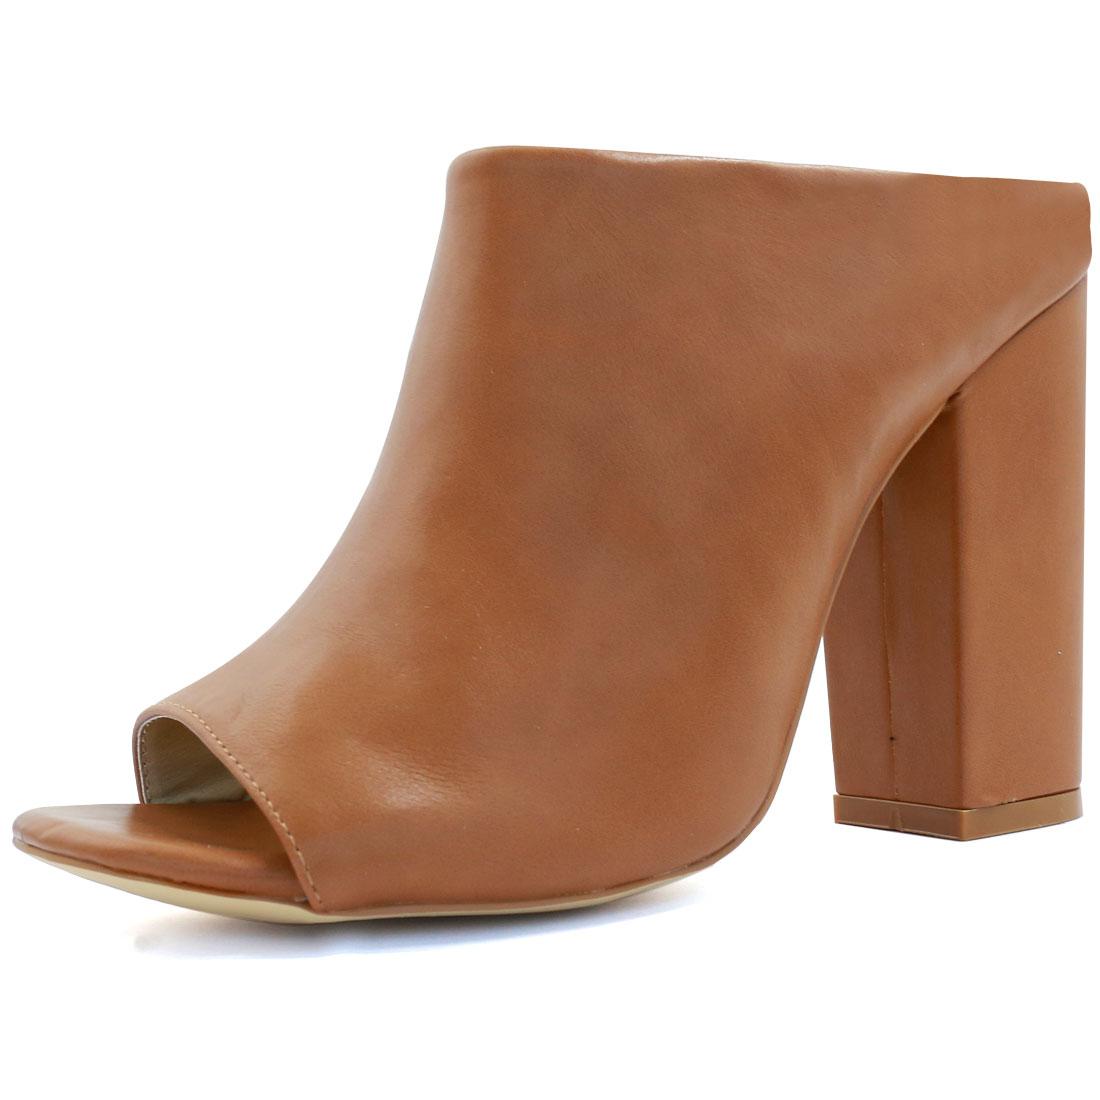 Woman Square Peep Toe Slip On Chunky High Heel Mules Brown US 8